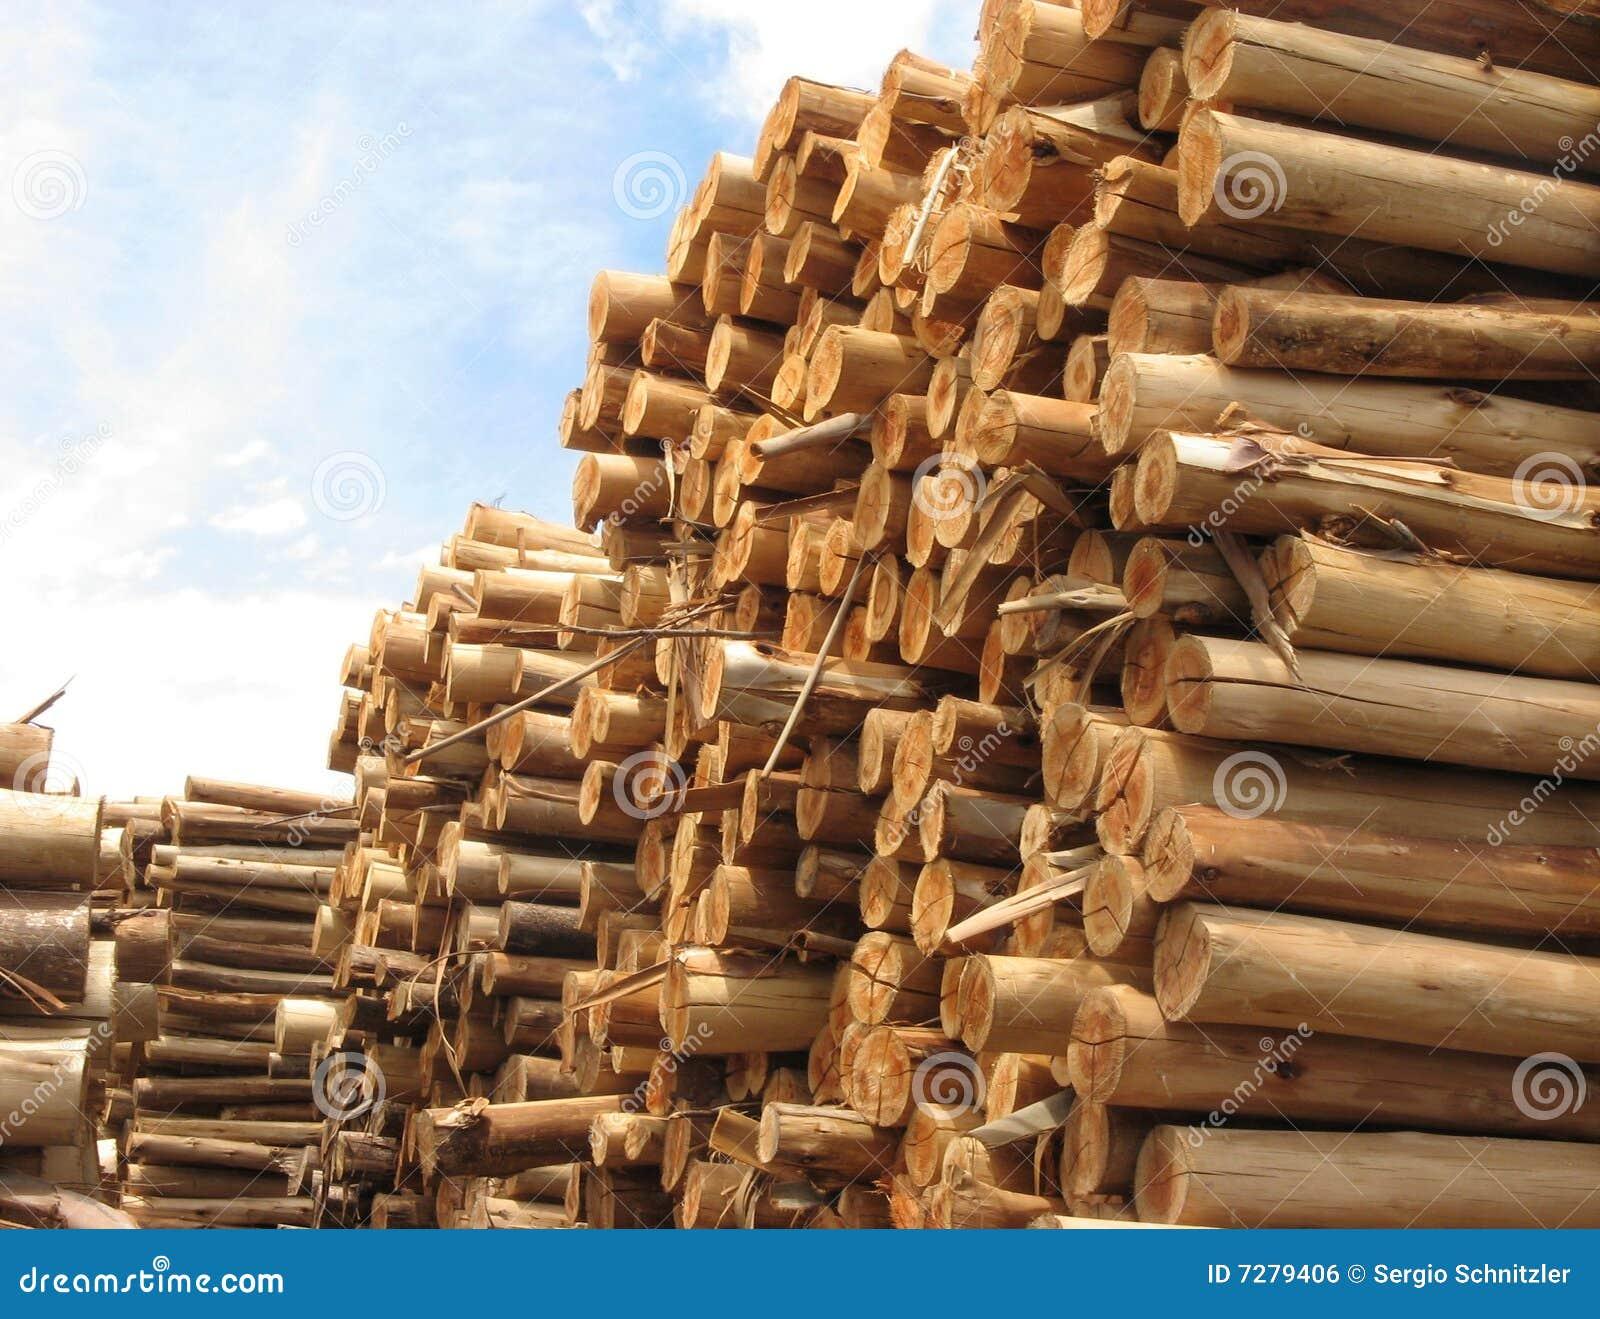 Pila de troncos para el papel